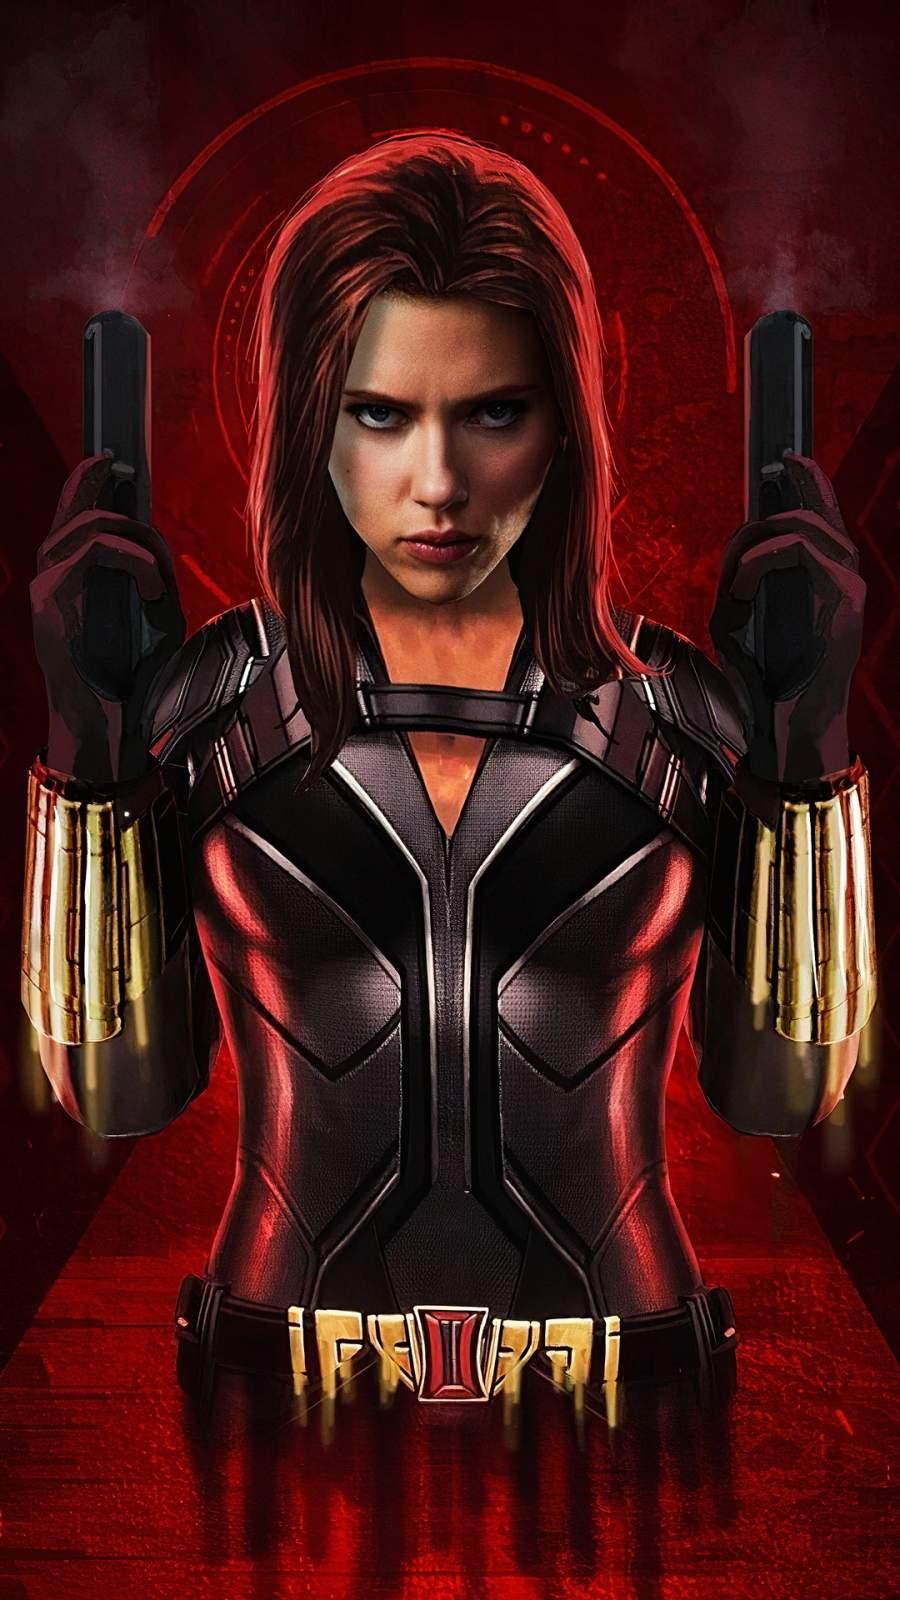 Black Widow Movie Art iPhone Wallpaper